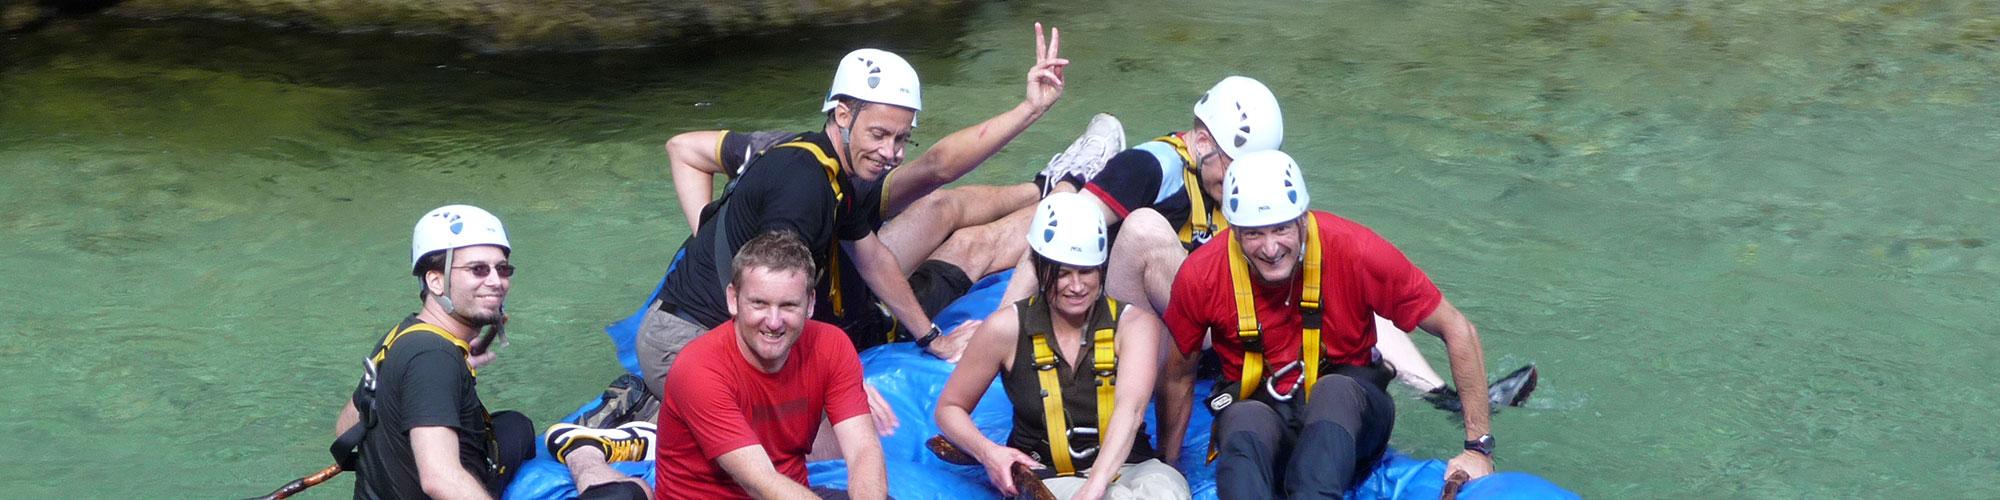 Outdoor Teambuilding Teamtraining Erlebnispädagogik Incentive Hochseilgarten